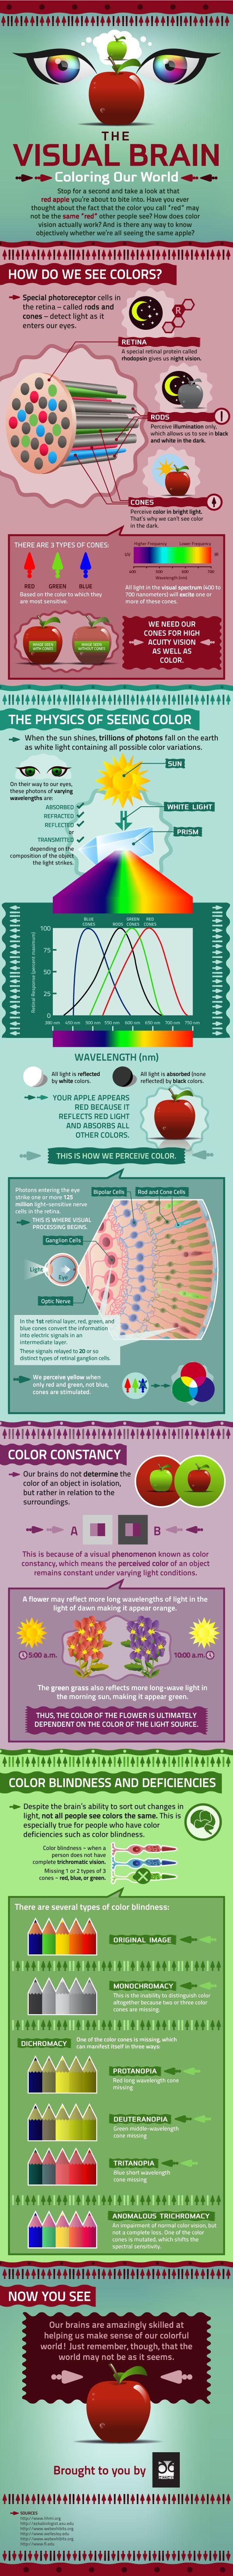 visual brain